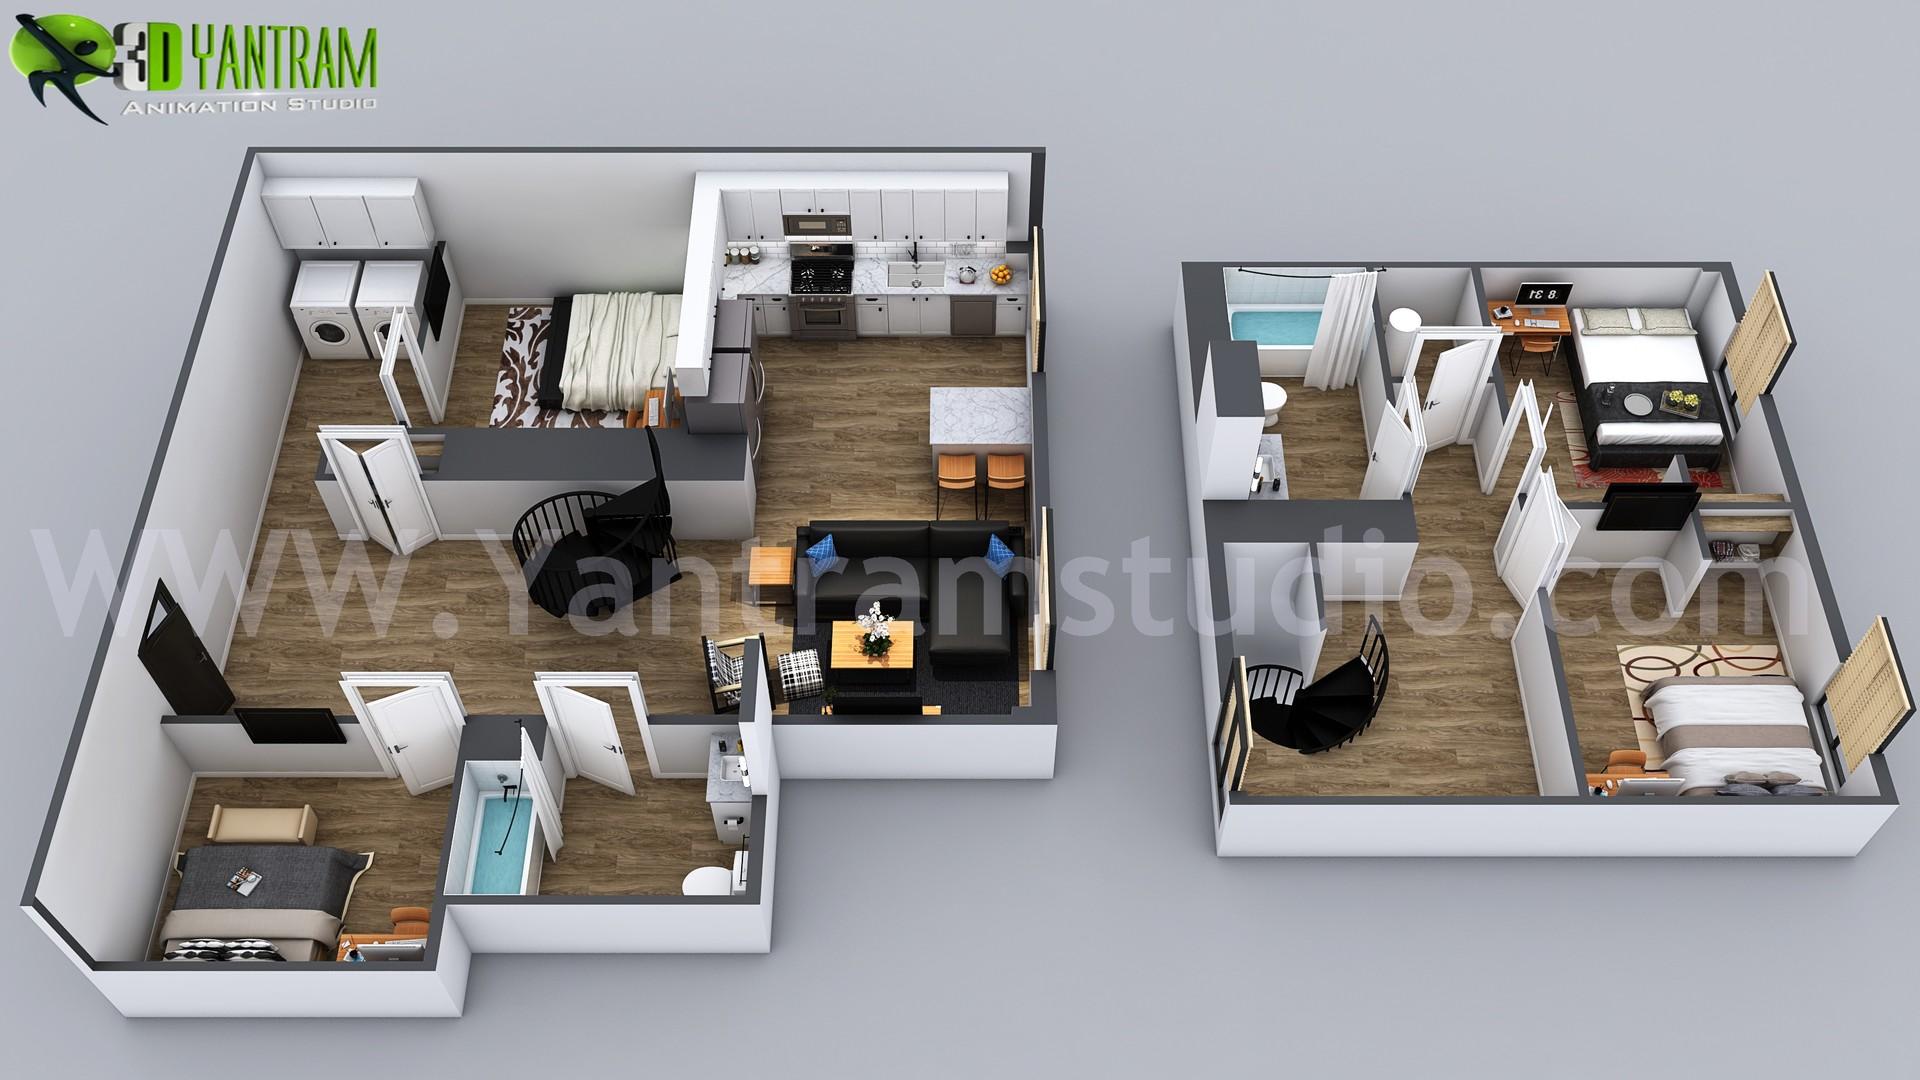 ArtStation - 3D Home Floor Plan Designs By Yantram floor plan ...